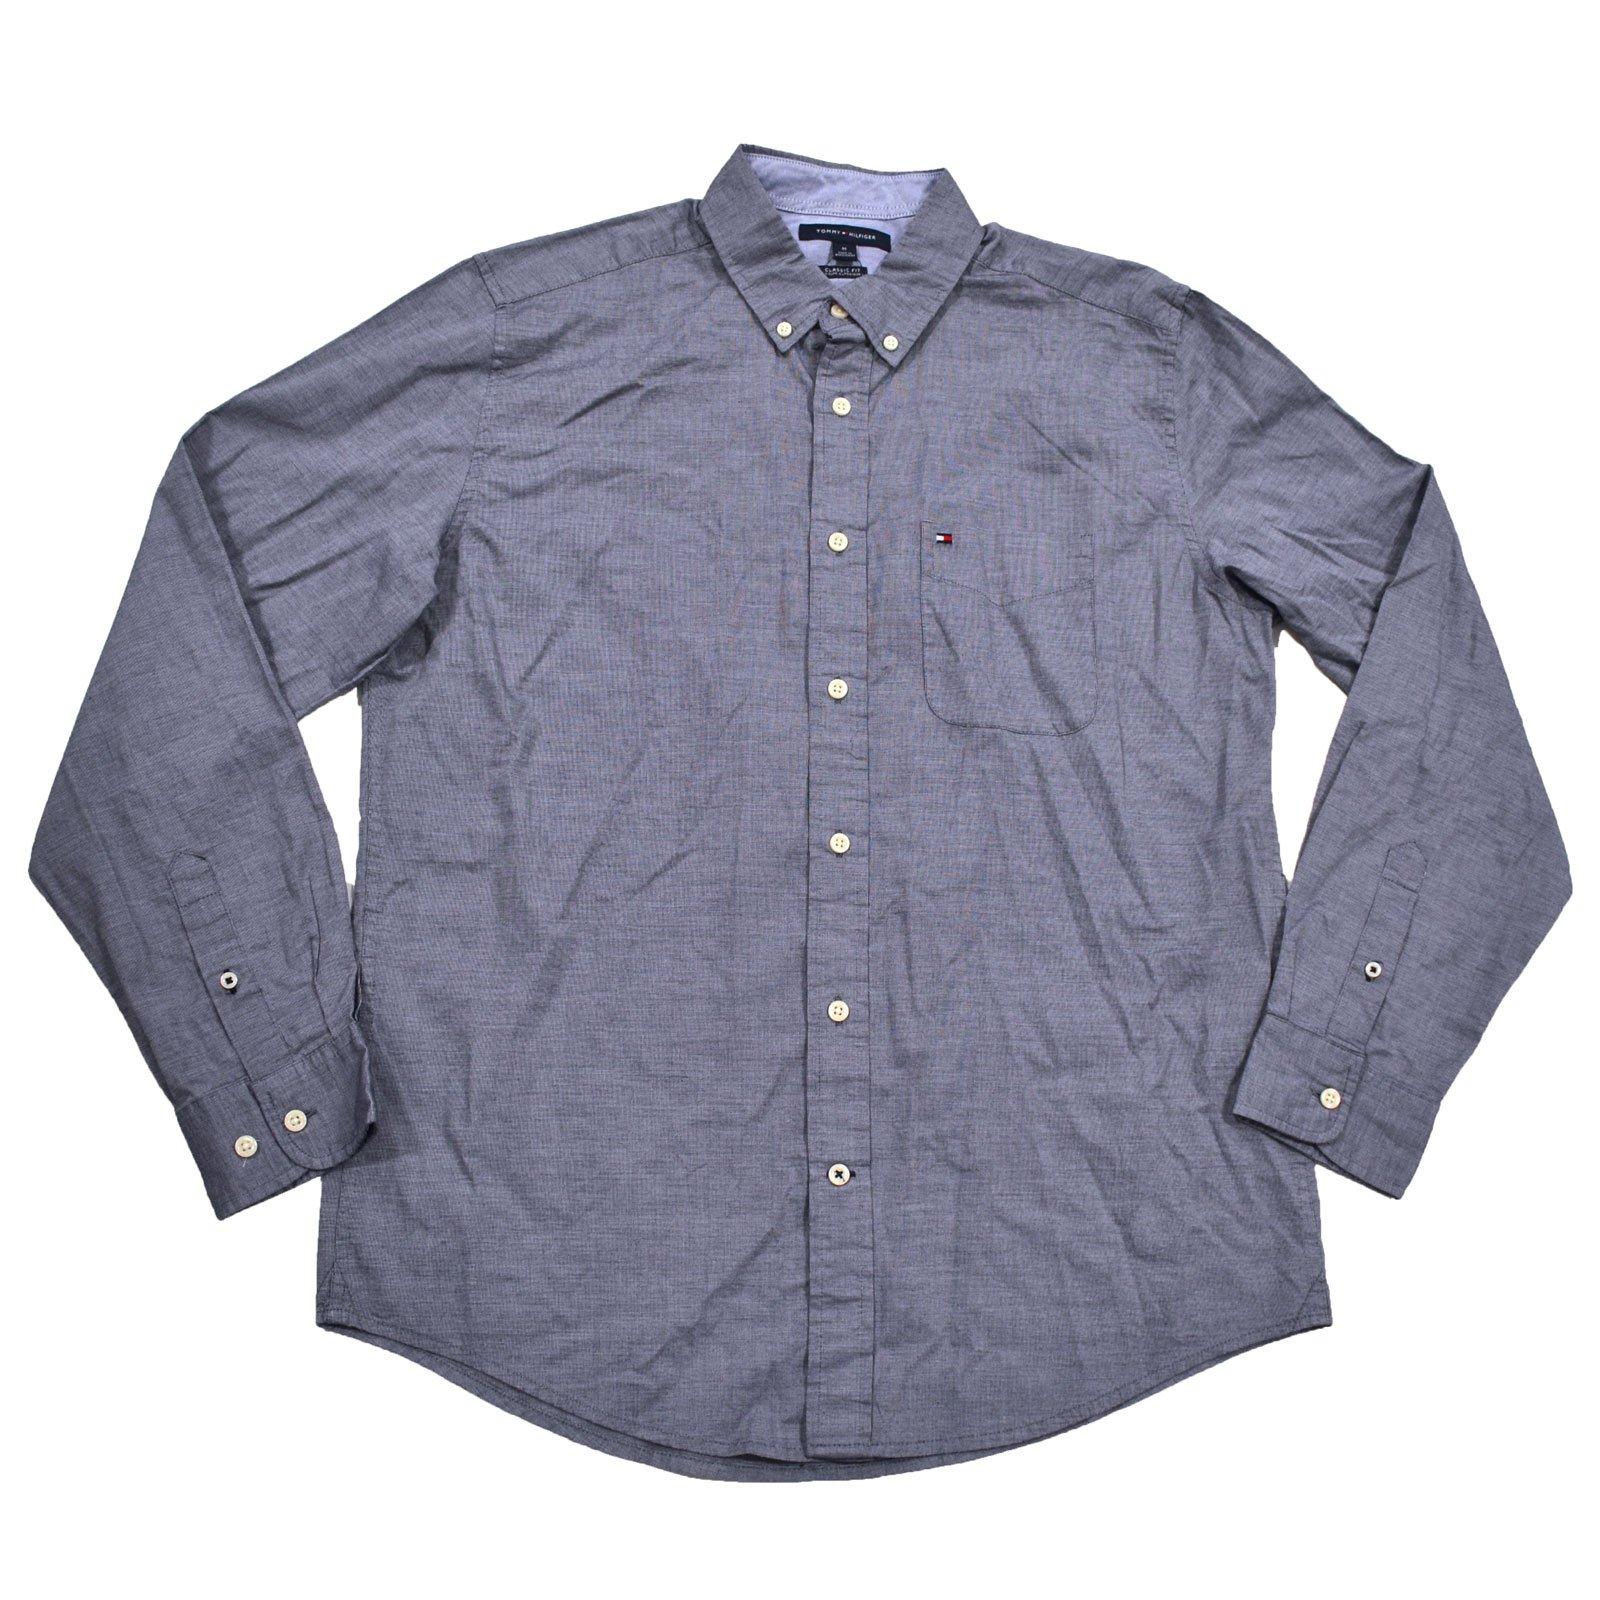 Tommy Hilfiger Mens Classic Fit Buttondown Shirt (L, Navy Blazer)